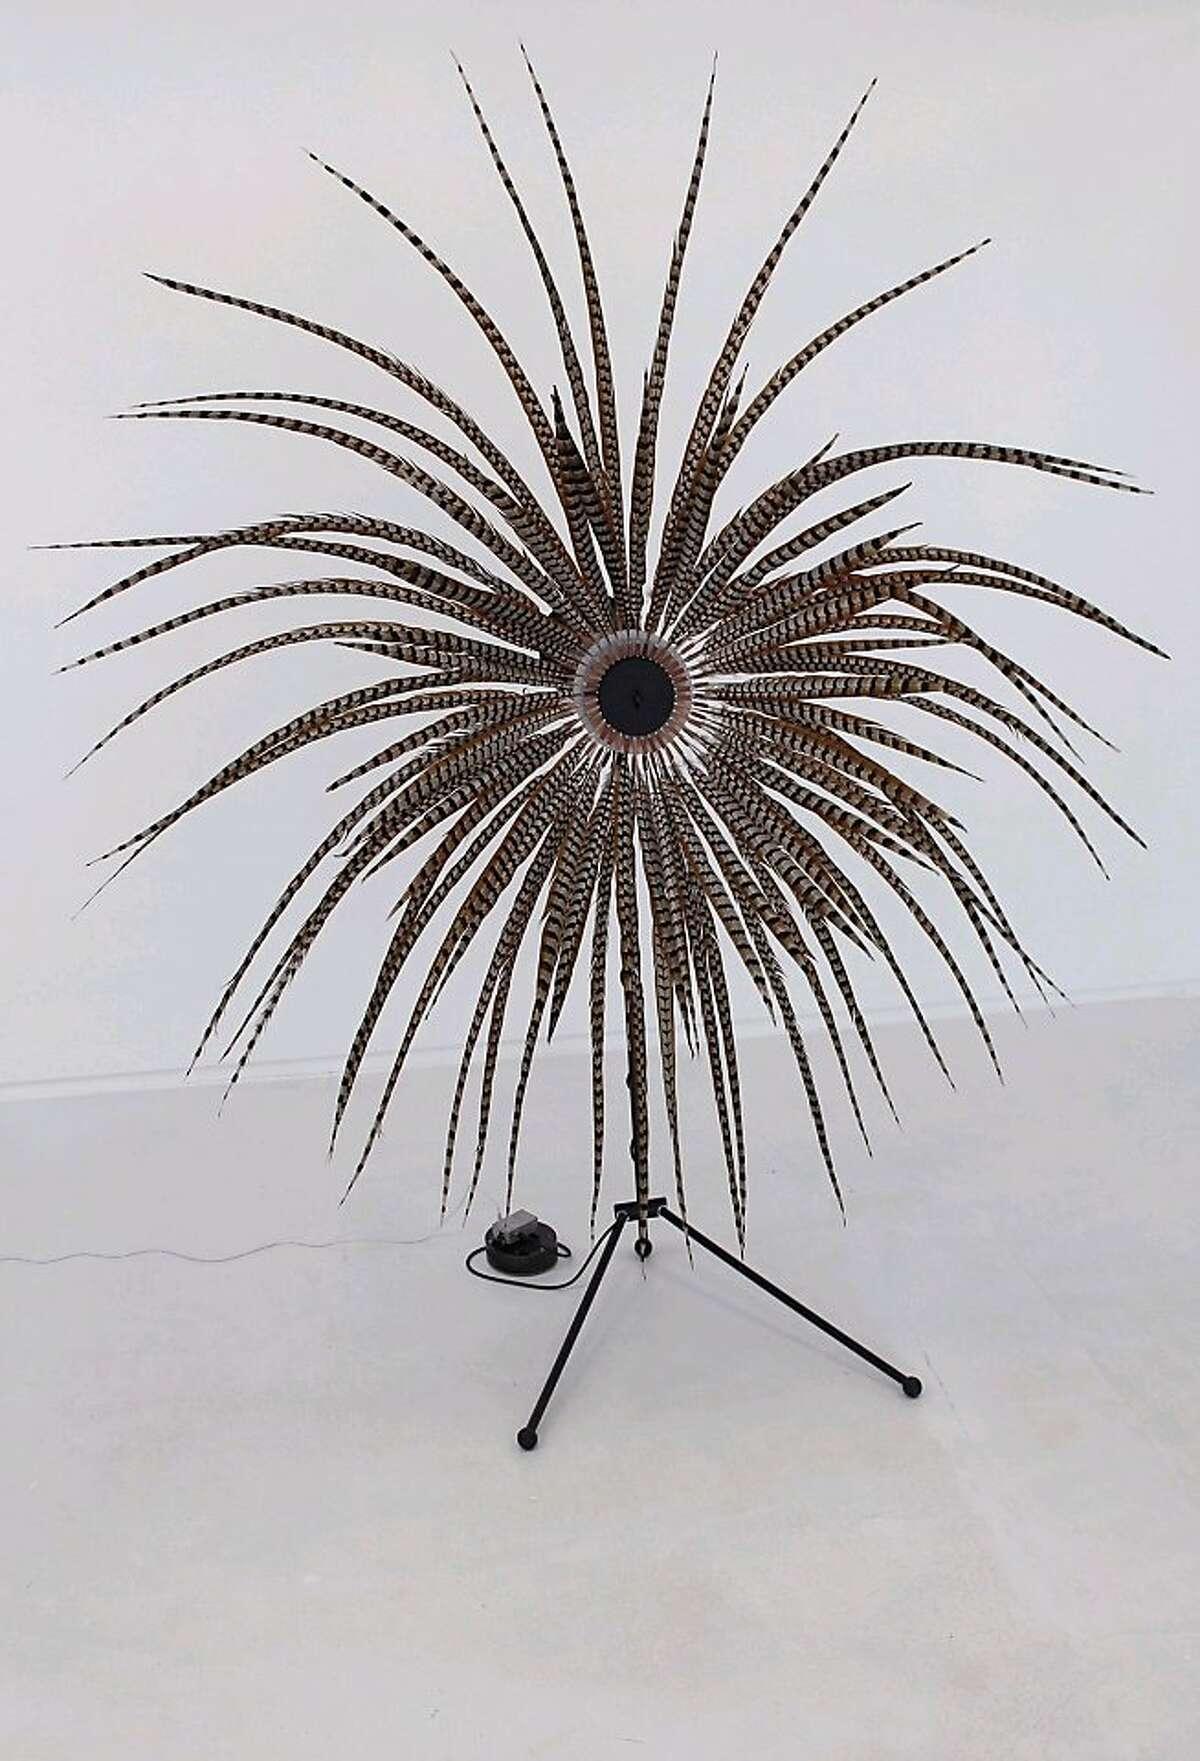 Alan Rath Qi, 2013 fiberglass, polypropylene, aluminum, custom electronics, feathers 11 x 9 x 5 feet Image courtesy of the artist and Hosfelt Gallery, San Francisco.